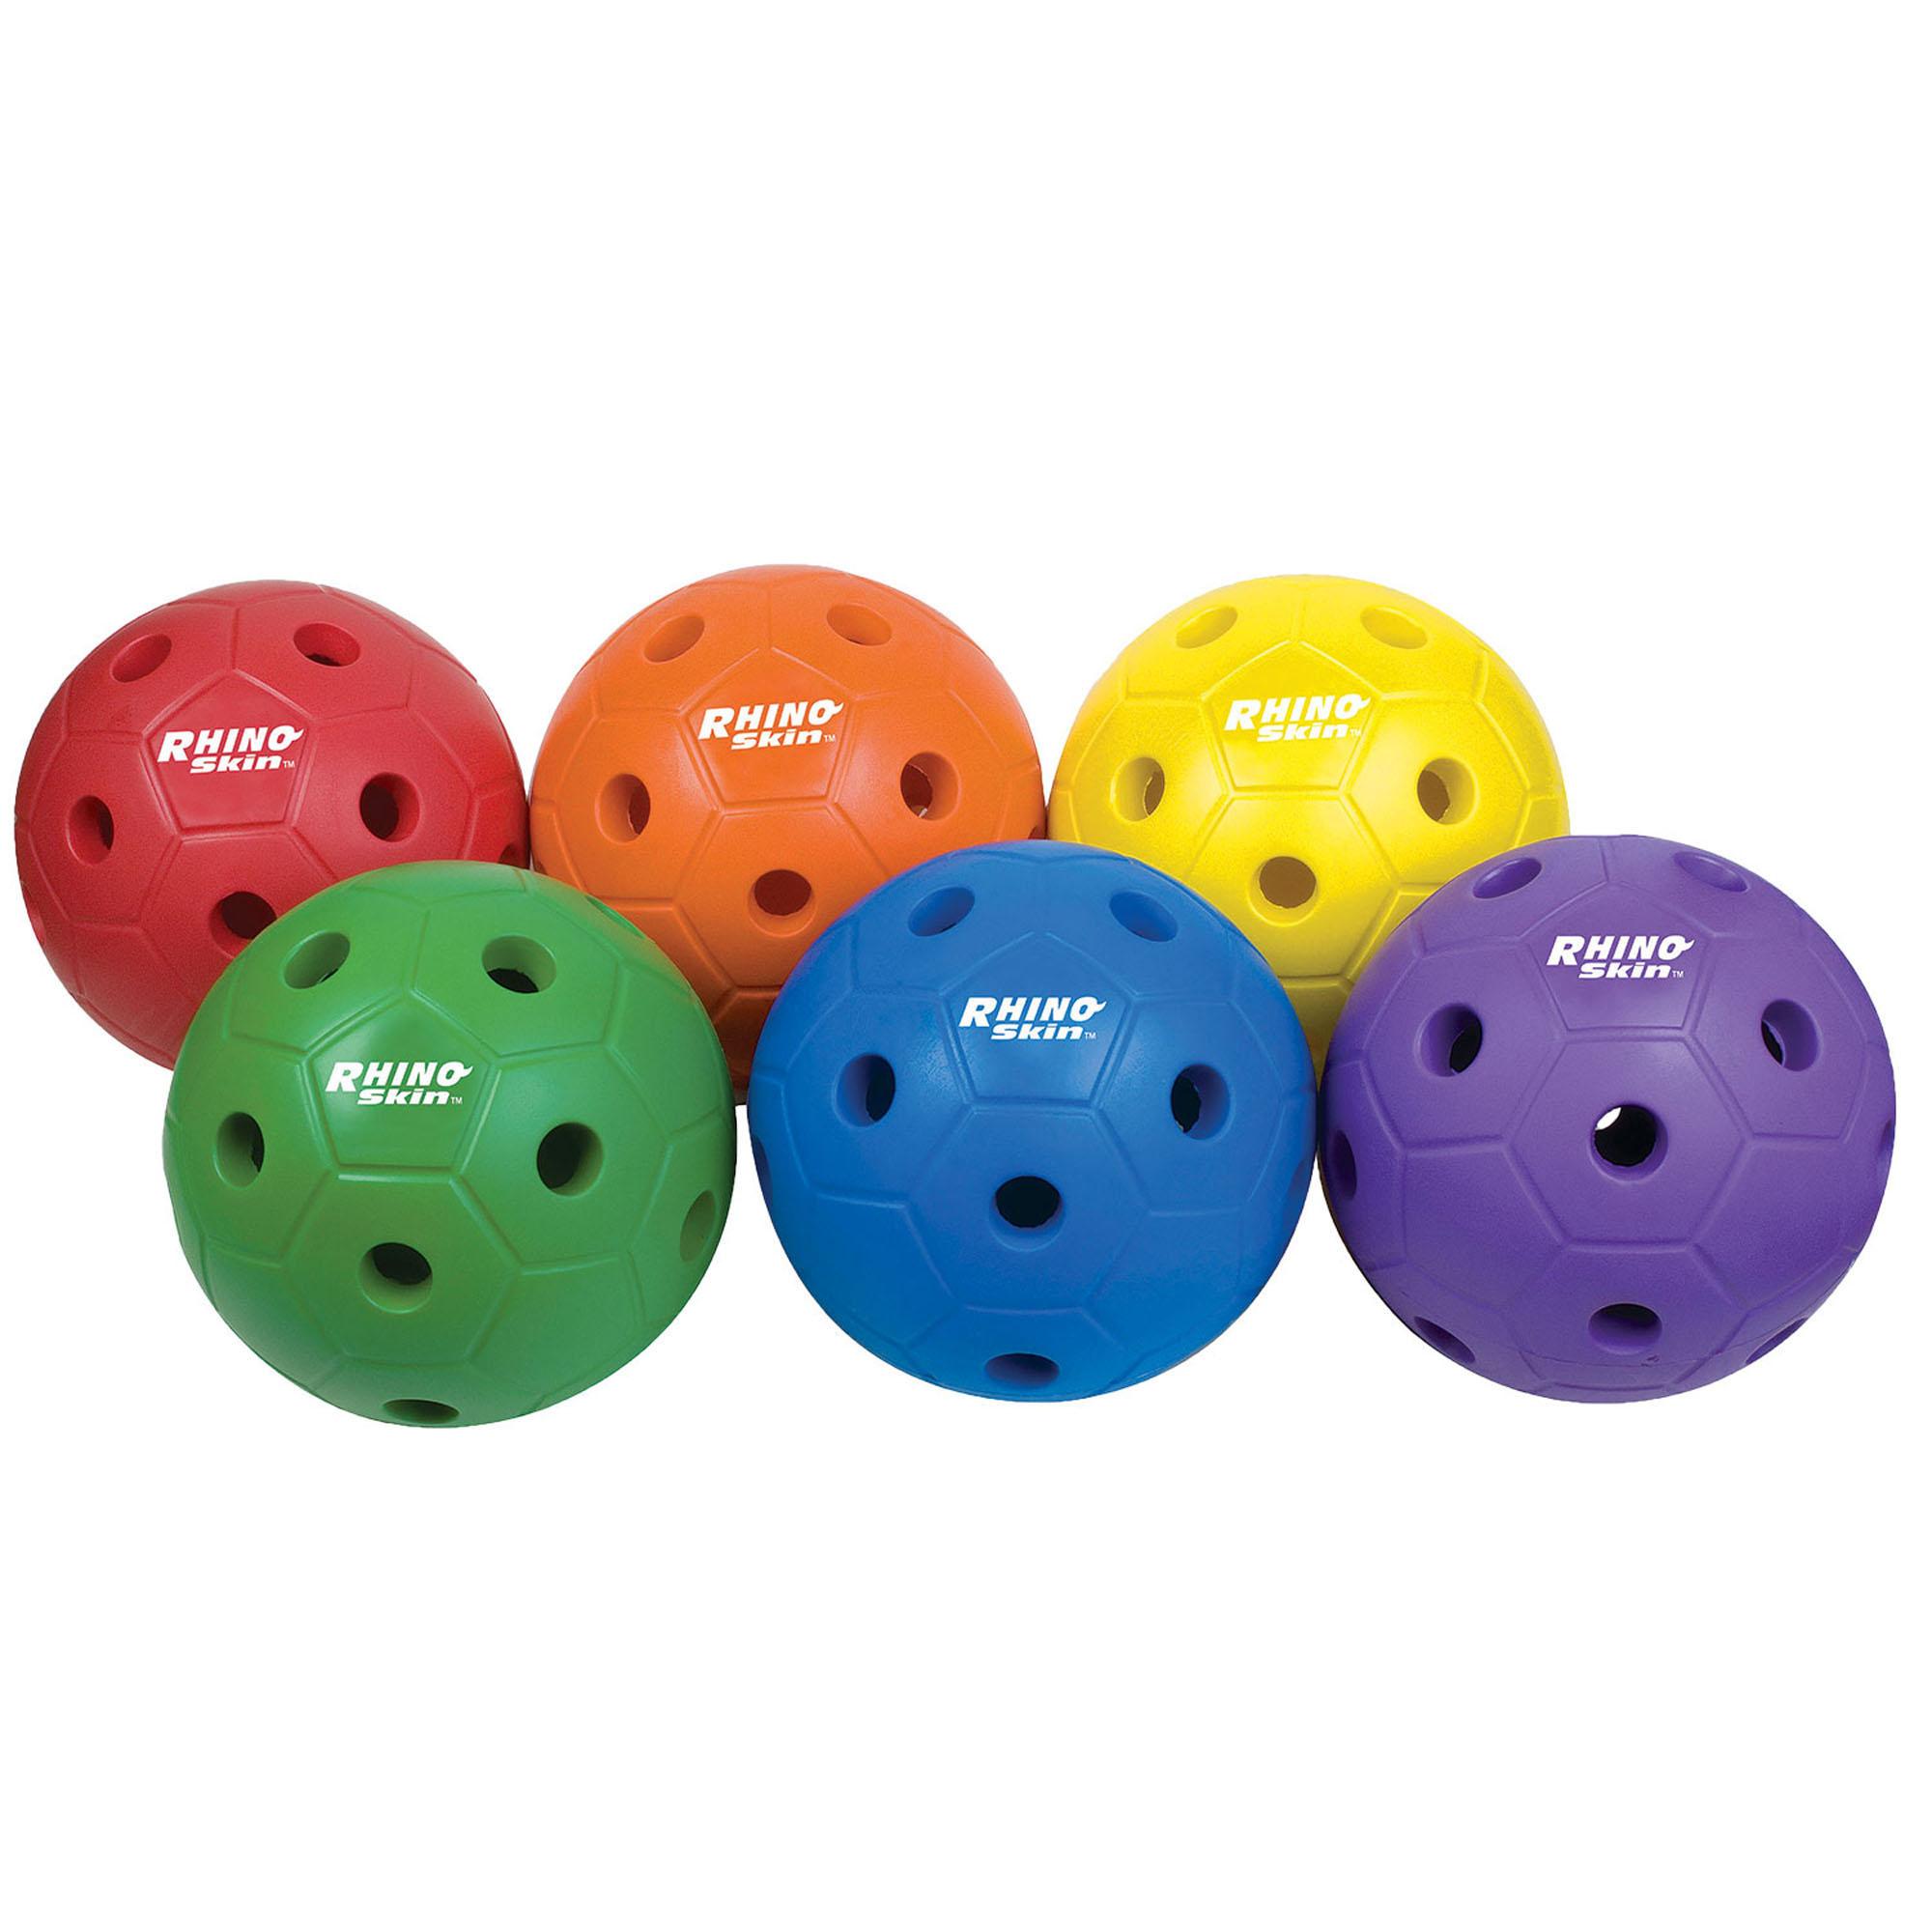 Rhino Skin® Sting Free Mini Soccer Ball Set, Assorted Colors, Set of 6